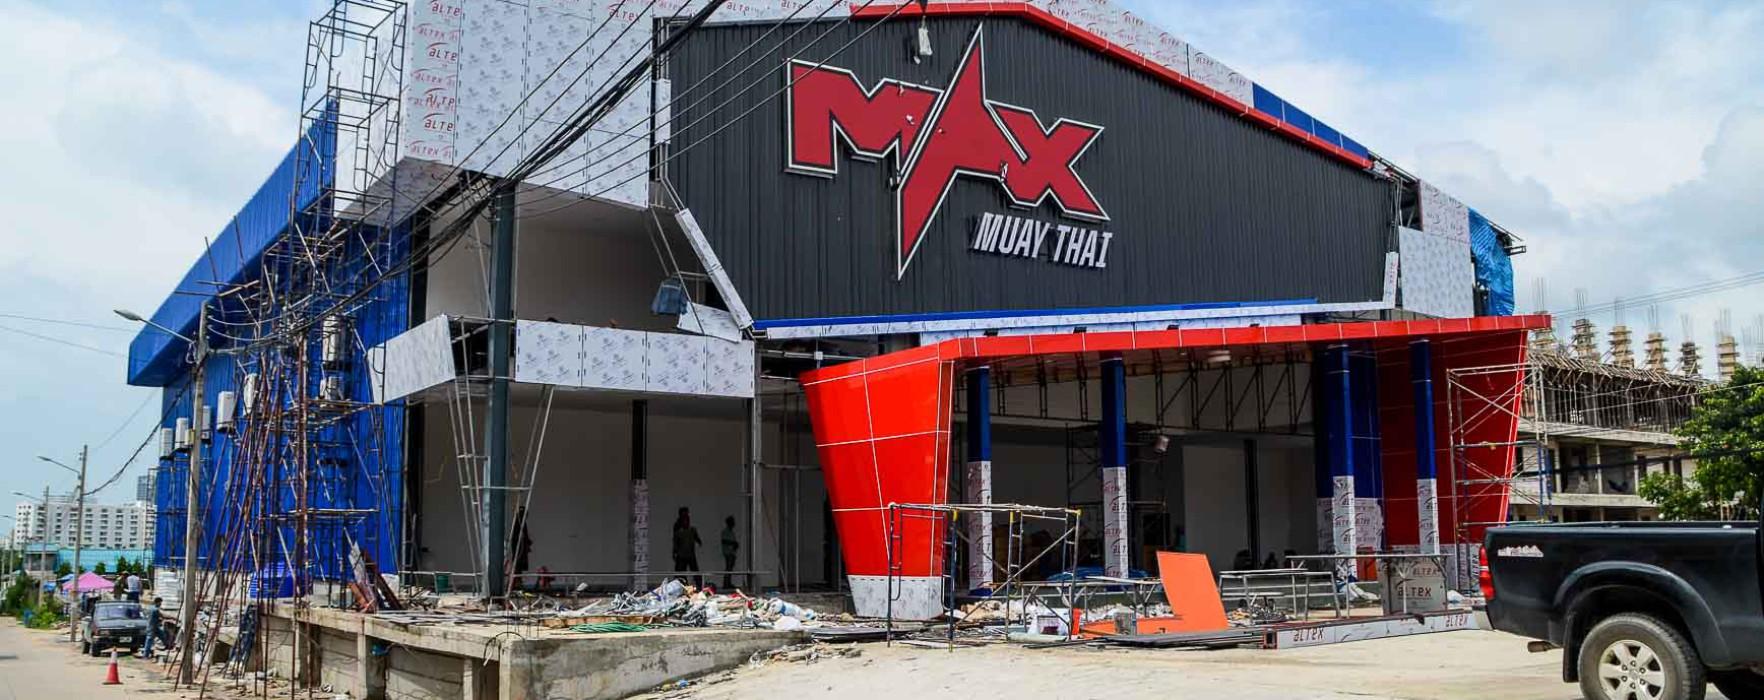 Exclusive pictures of the brand new Max Muay Thai Stadium Pattaya